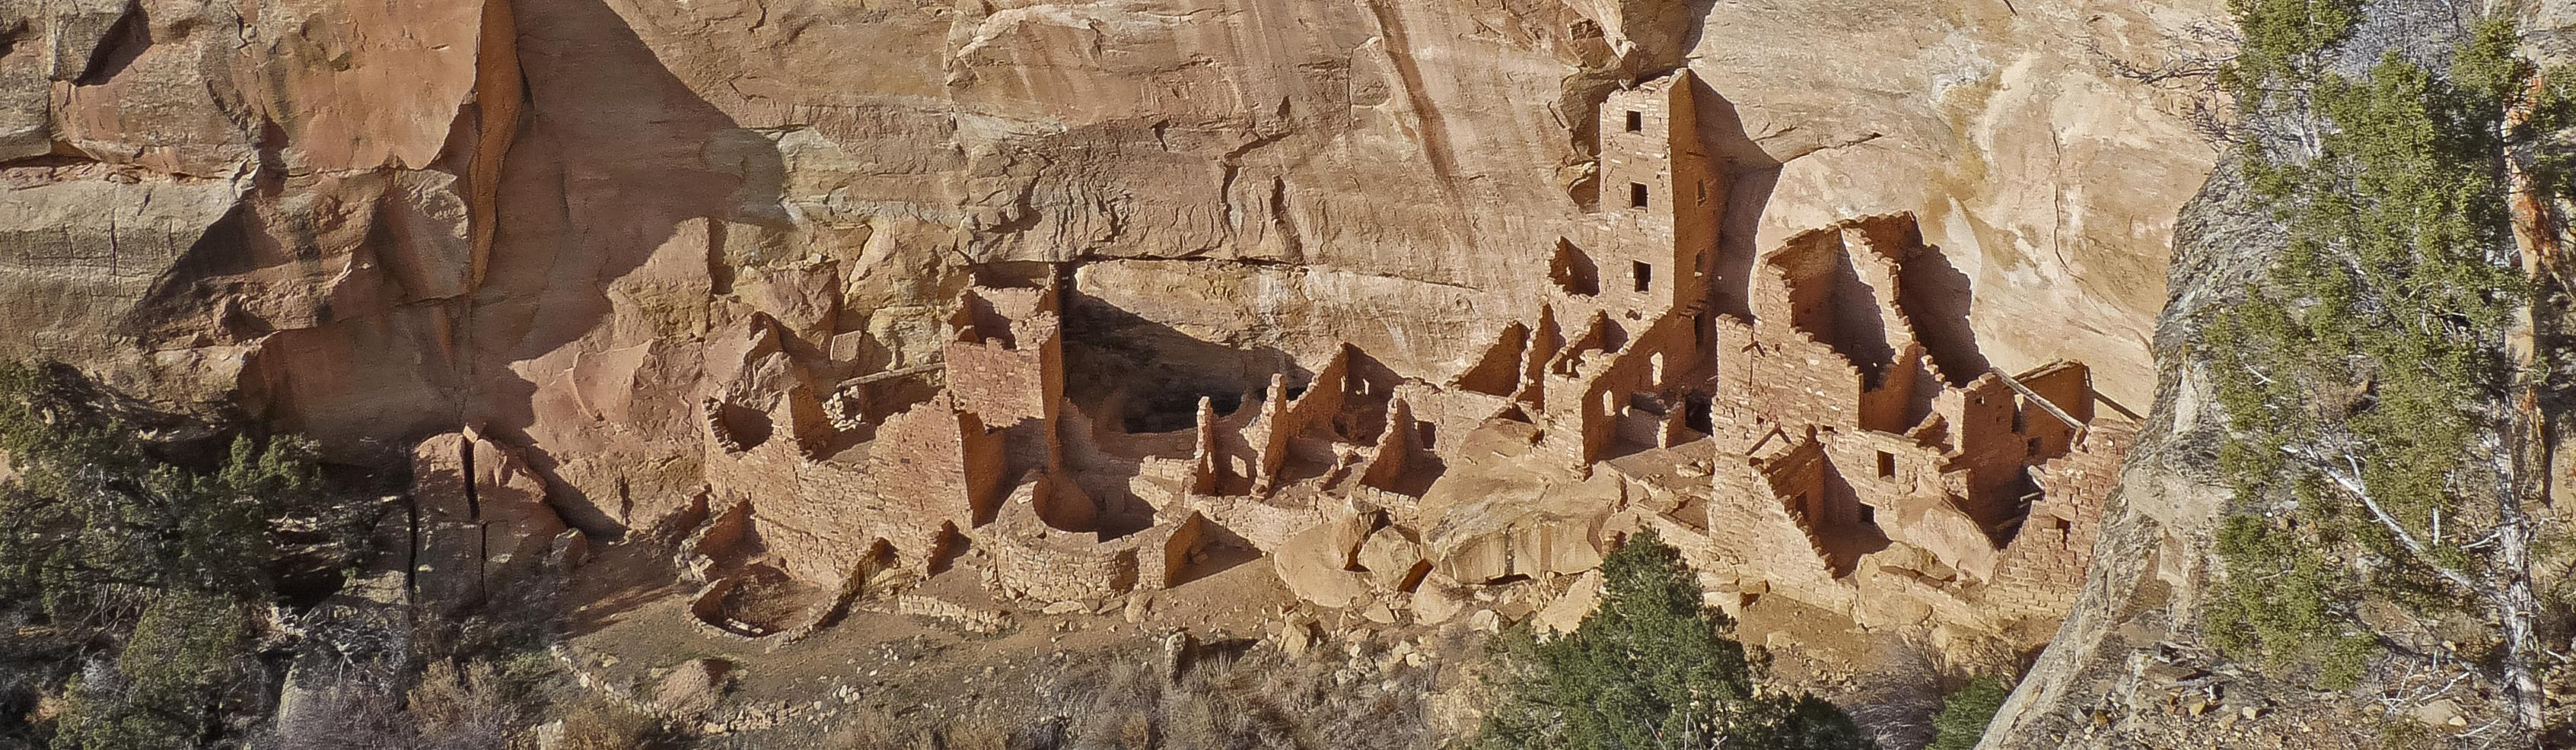 Mesa Verde National Park (U.S. National Park Service)